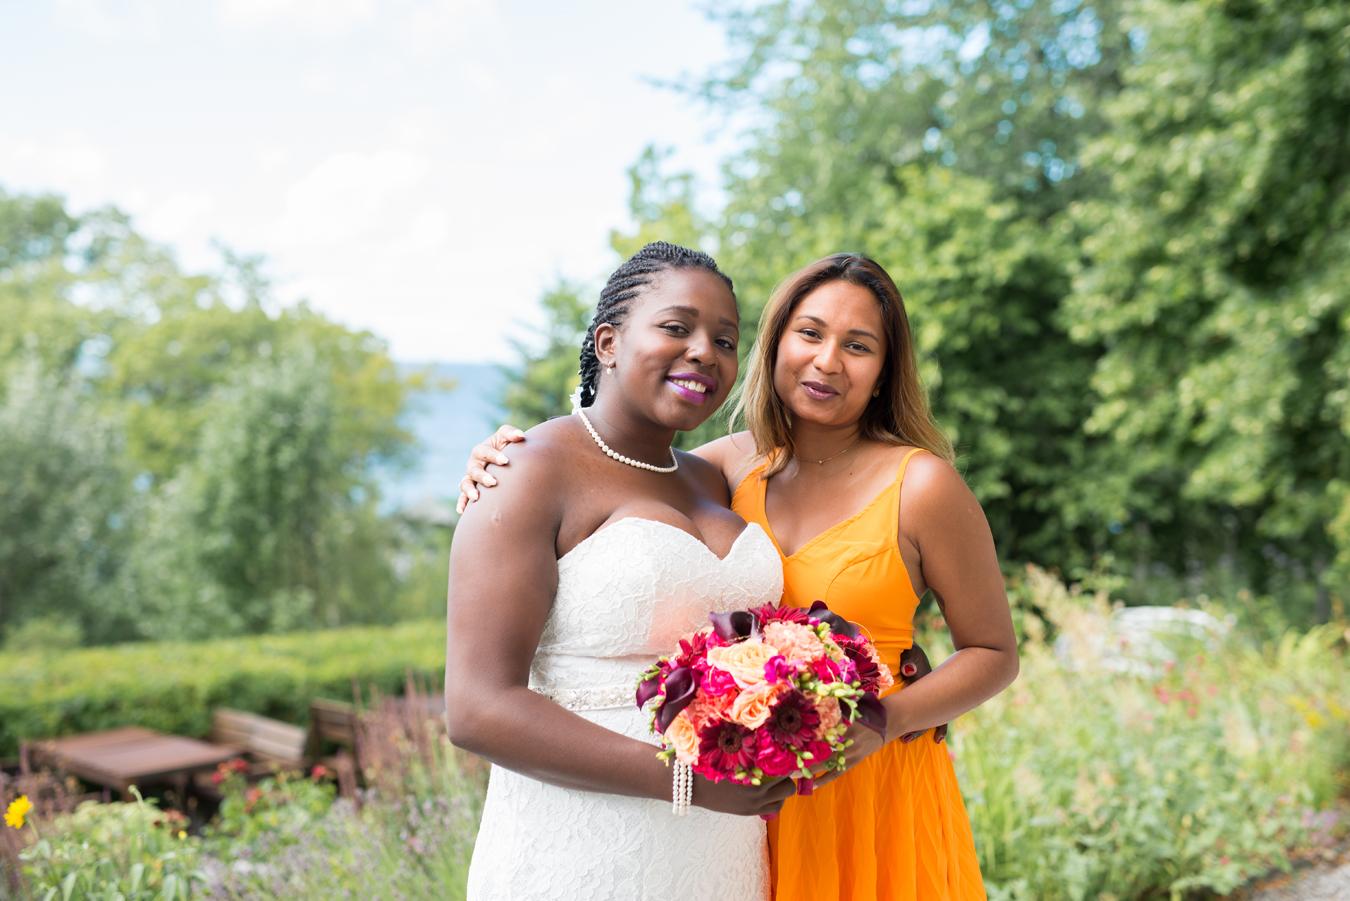 009-bröllop-gotland-fridhem-neas-fotografi.jpg